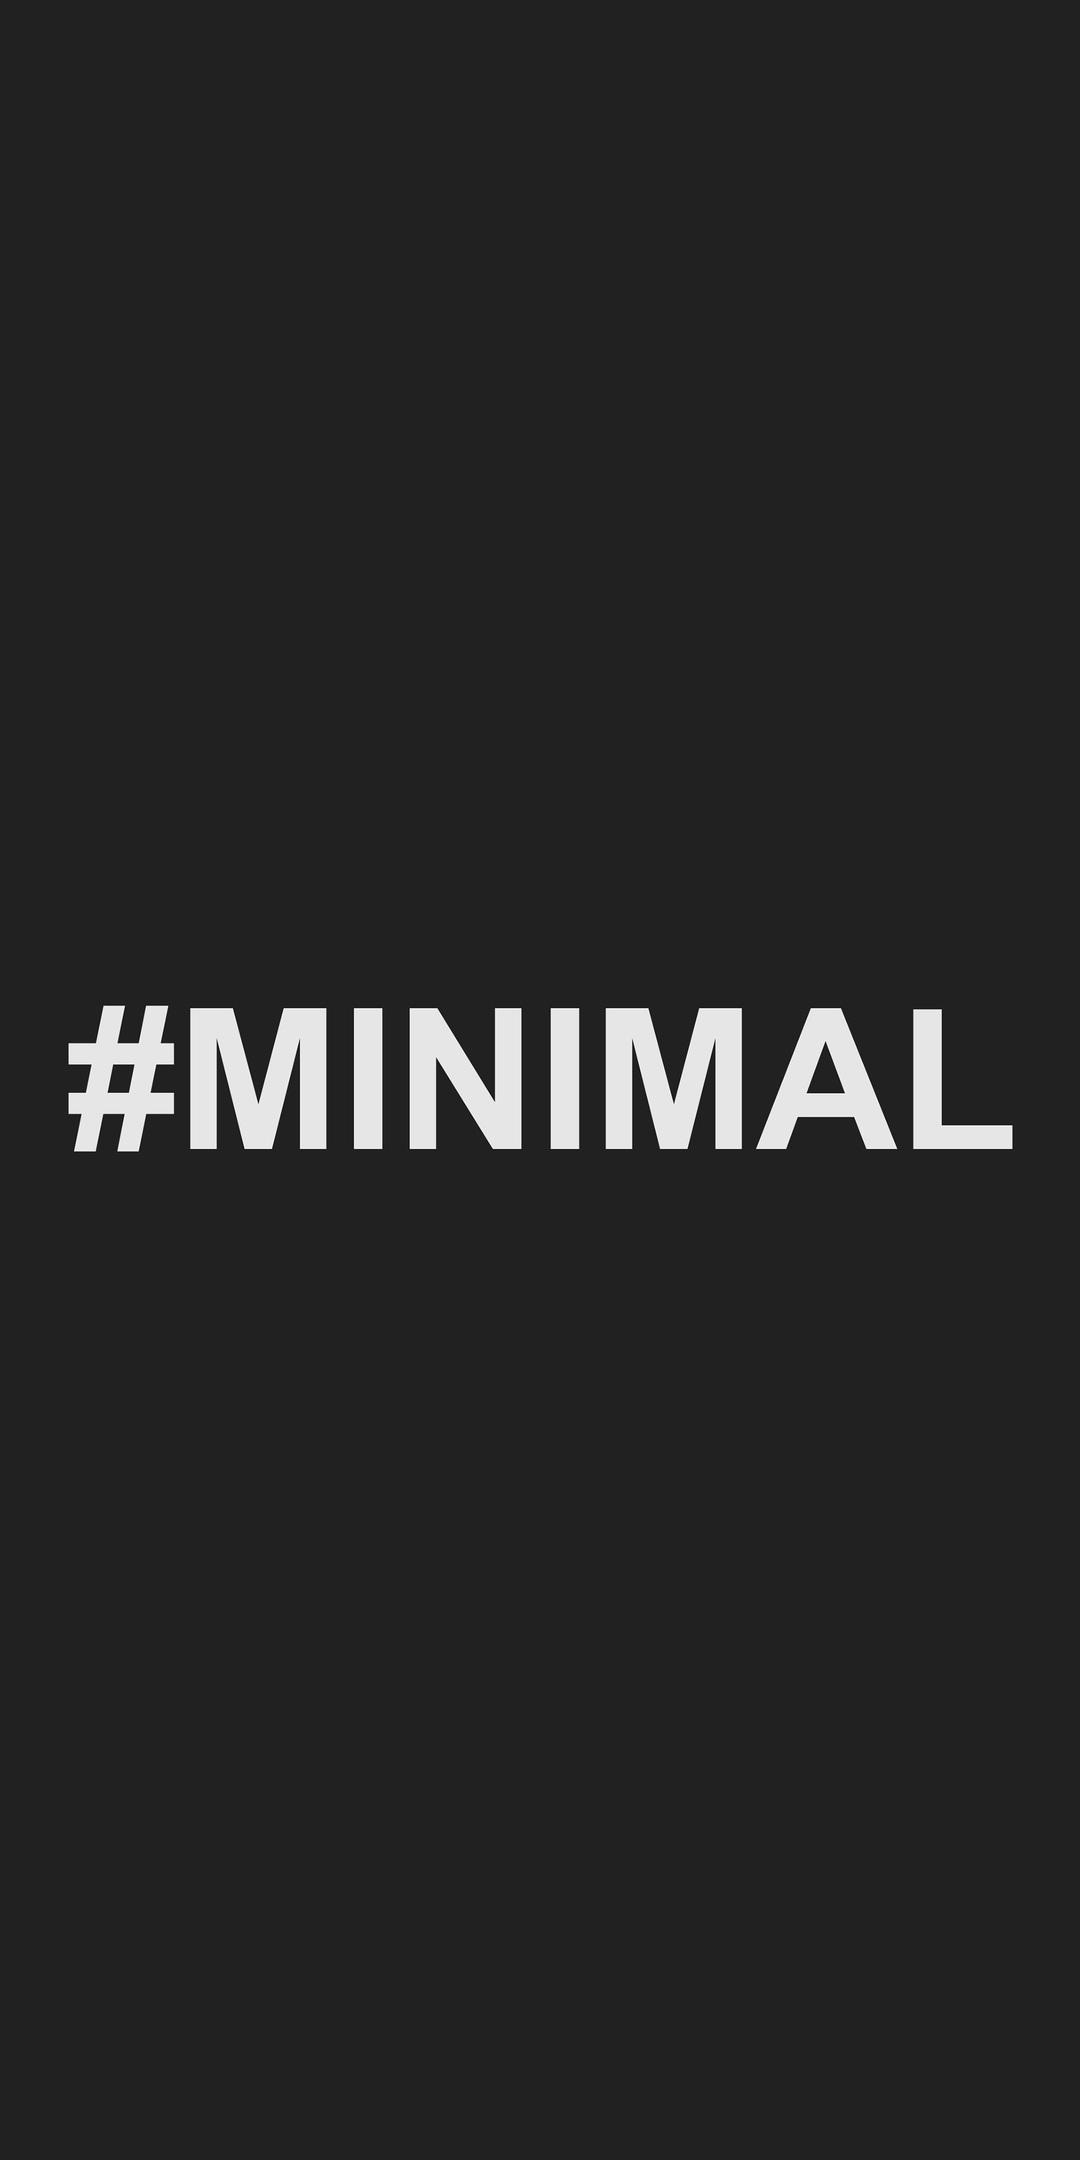 minimal-typography-s7.jpg